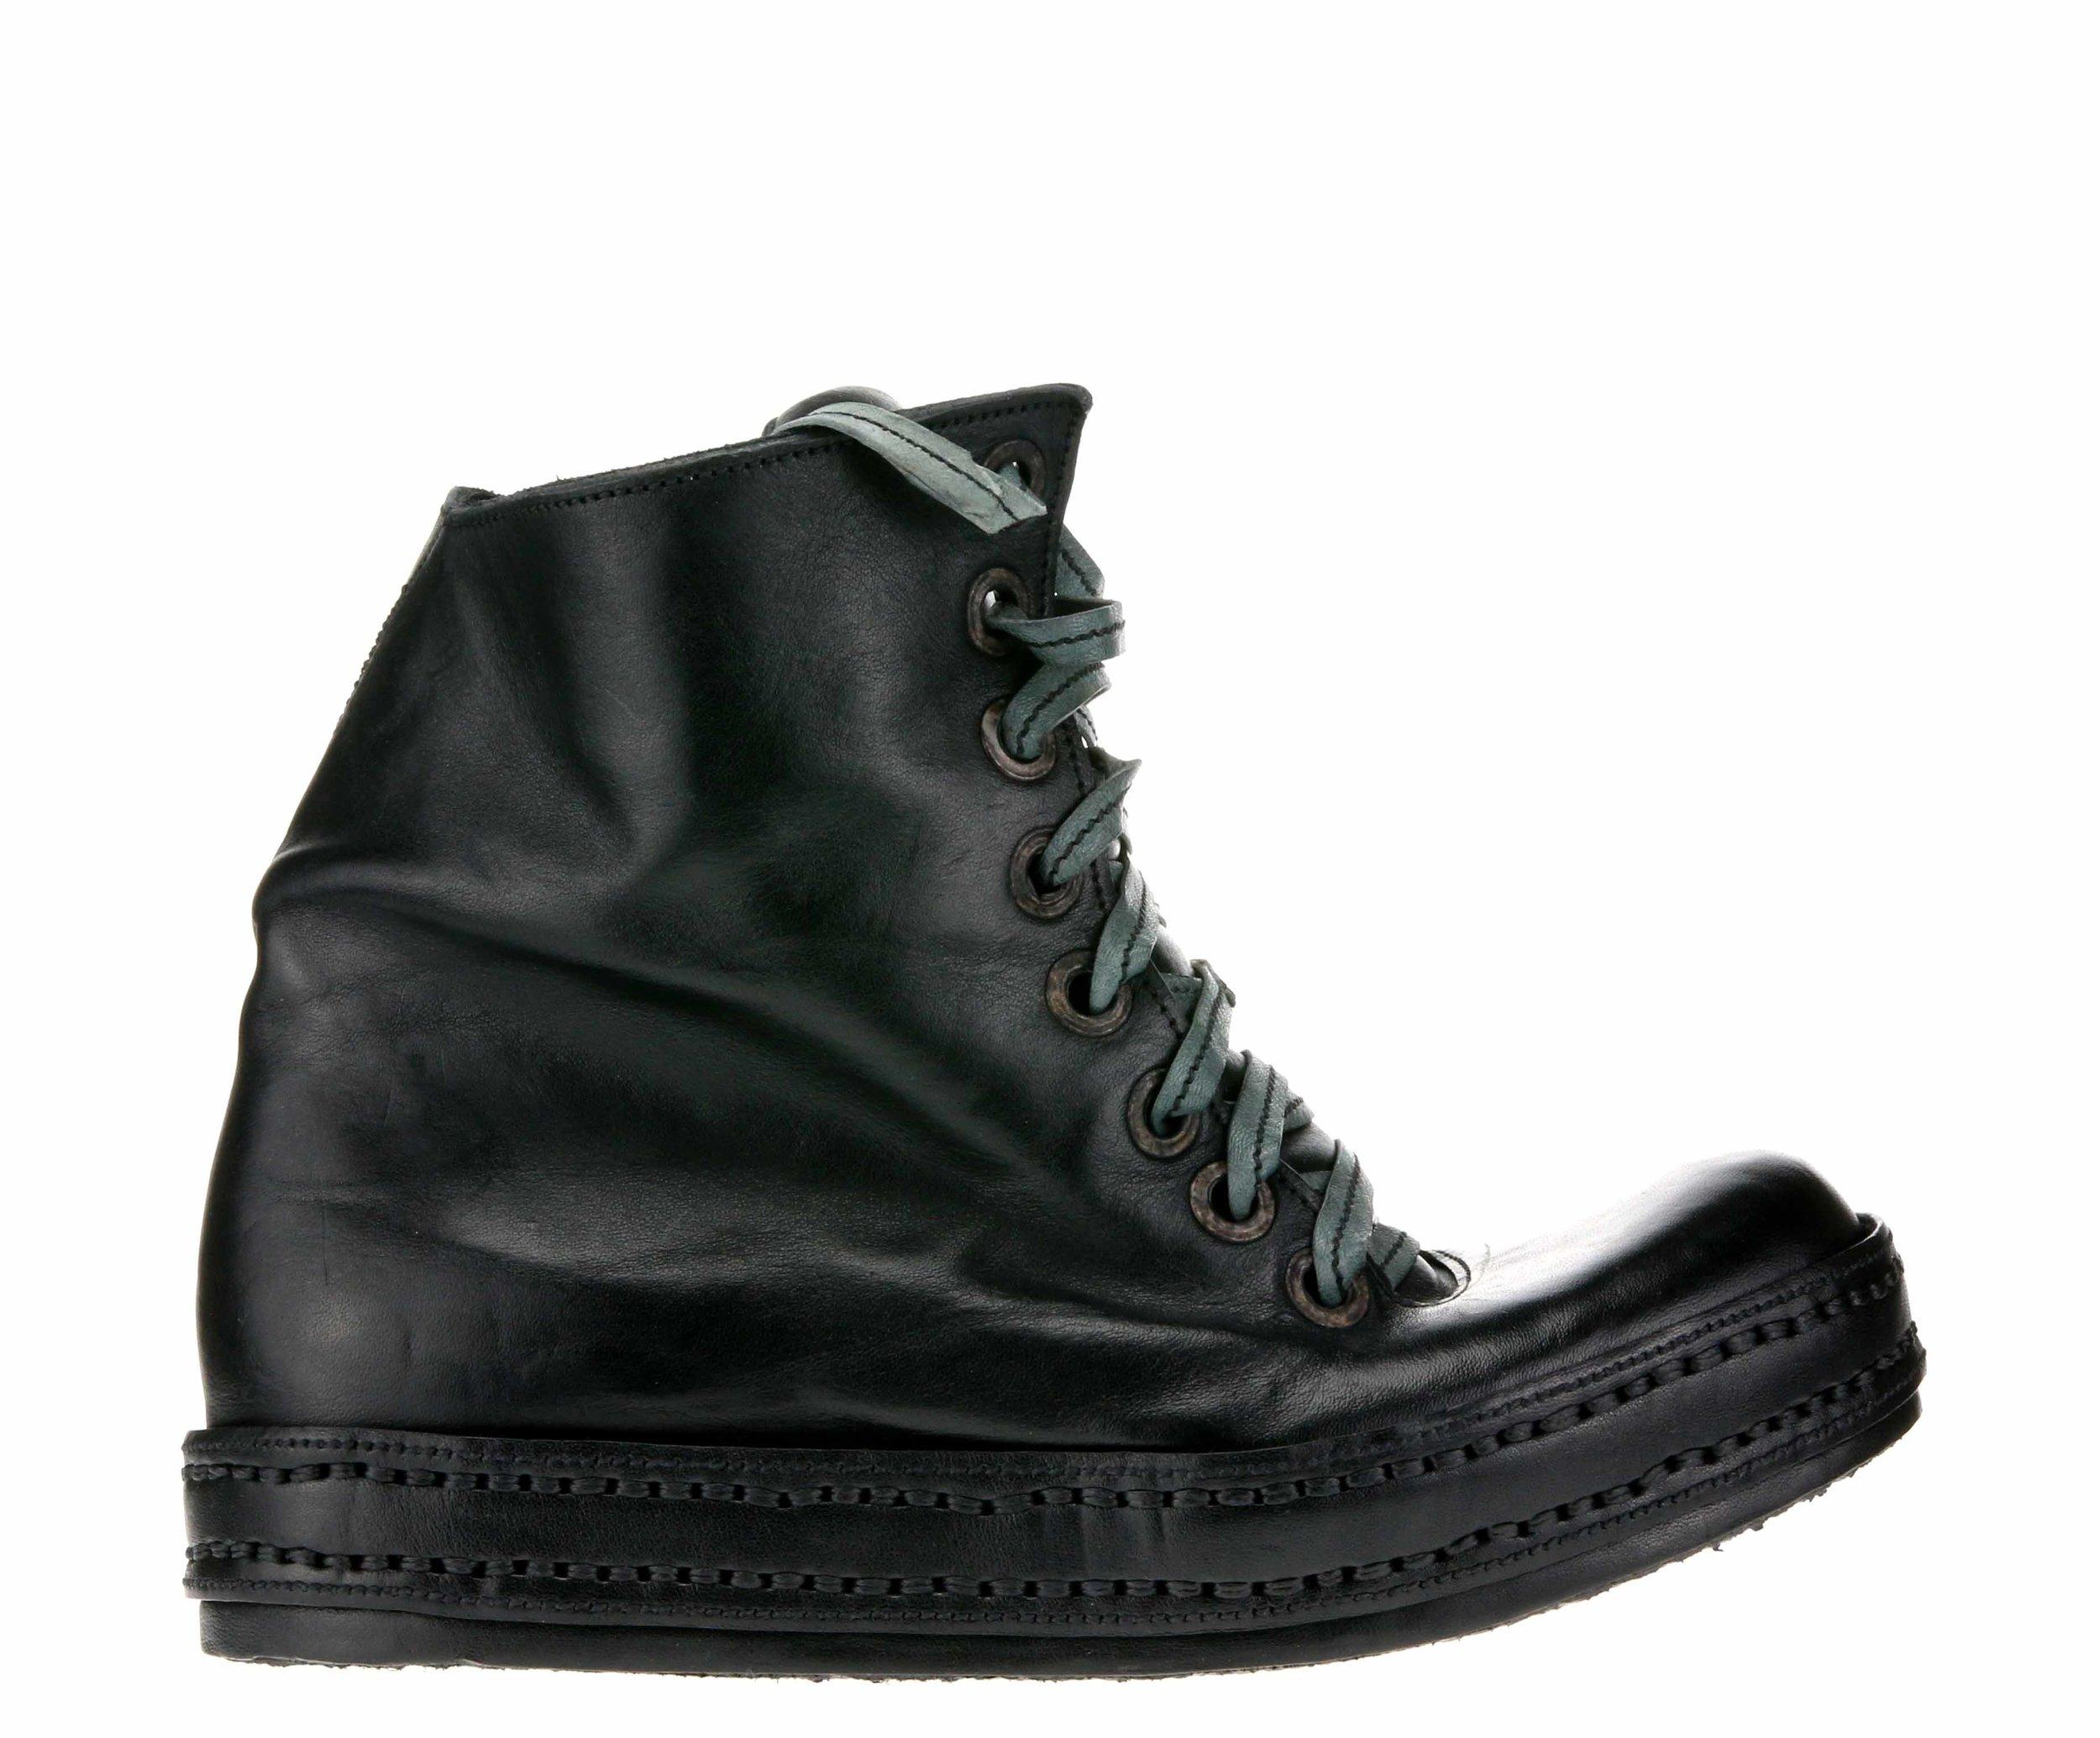 8Hole Sk8 Black